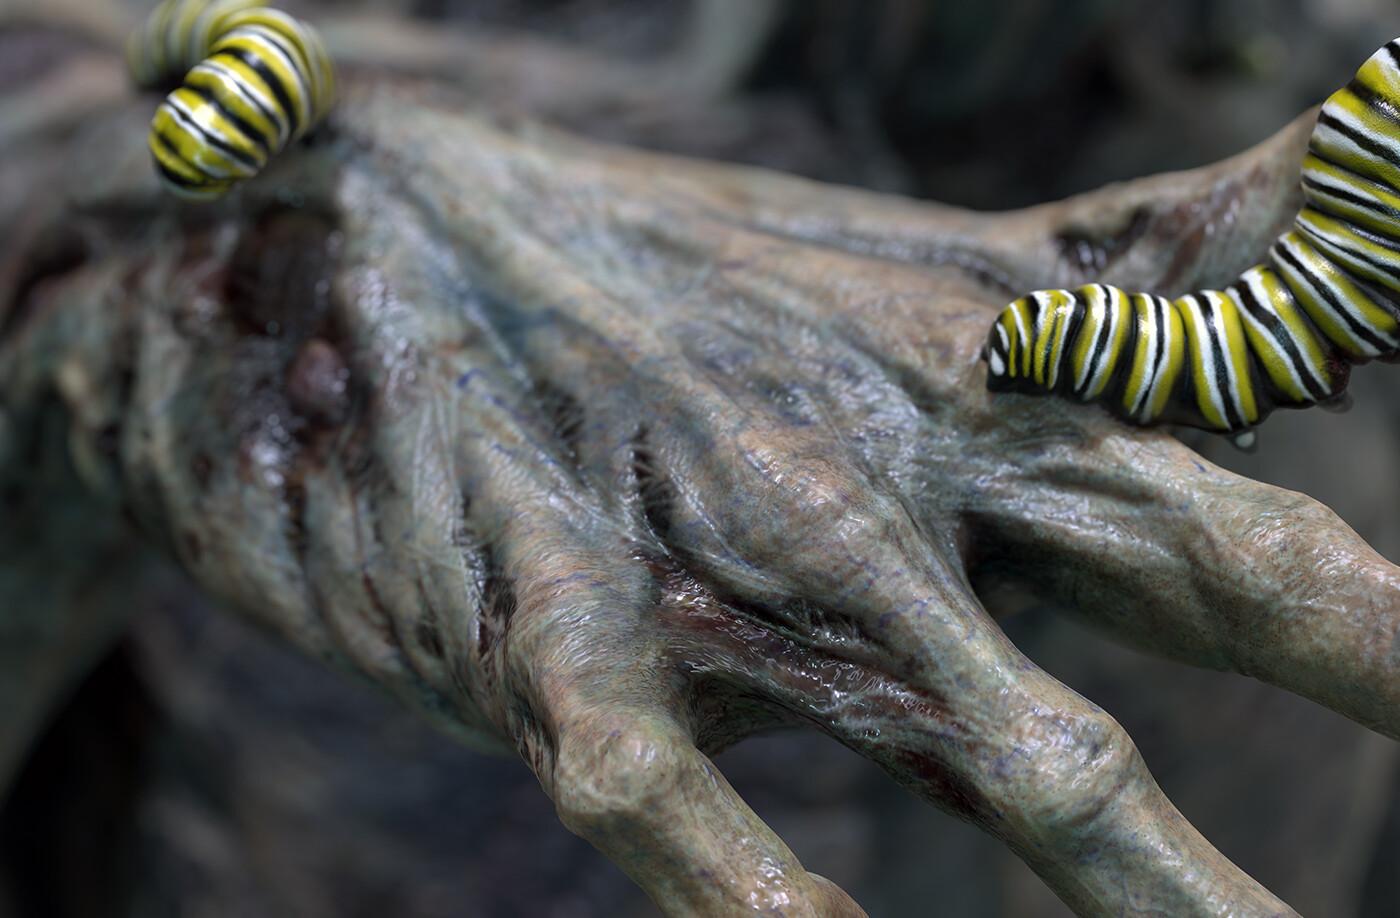 Zombie hand close up